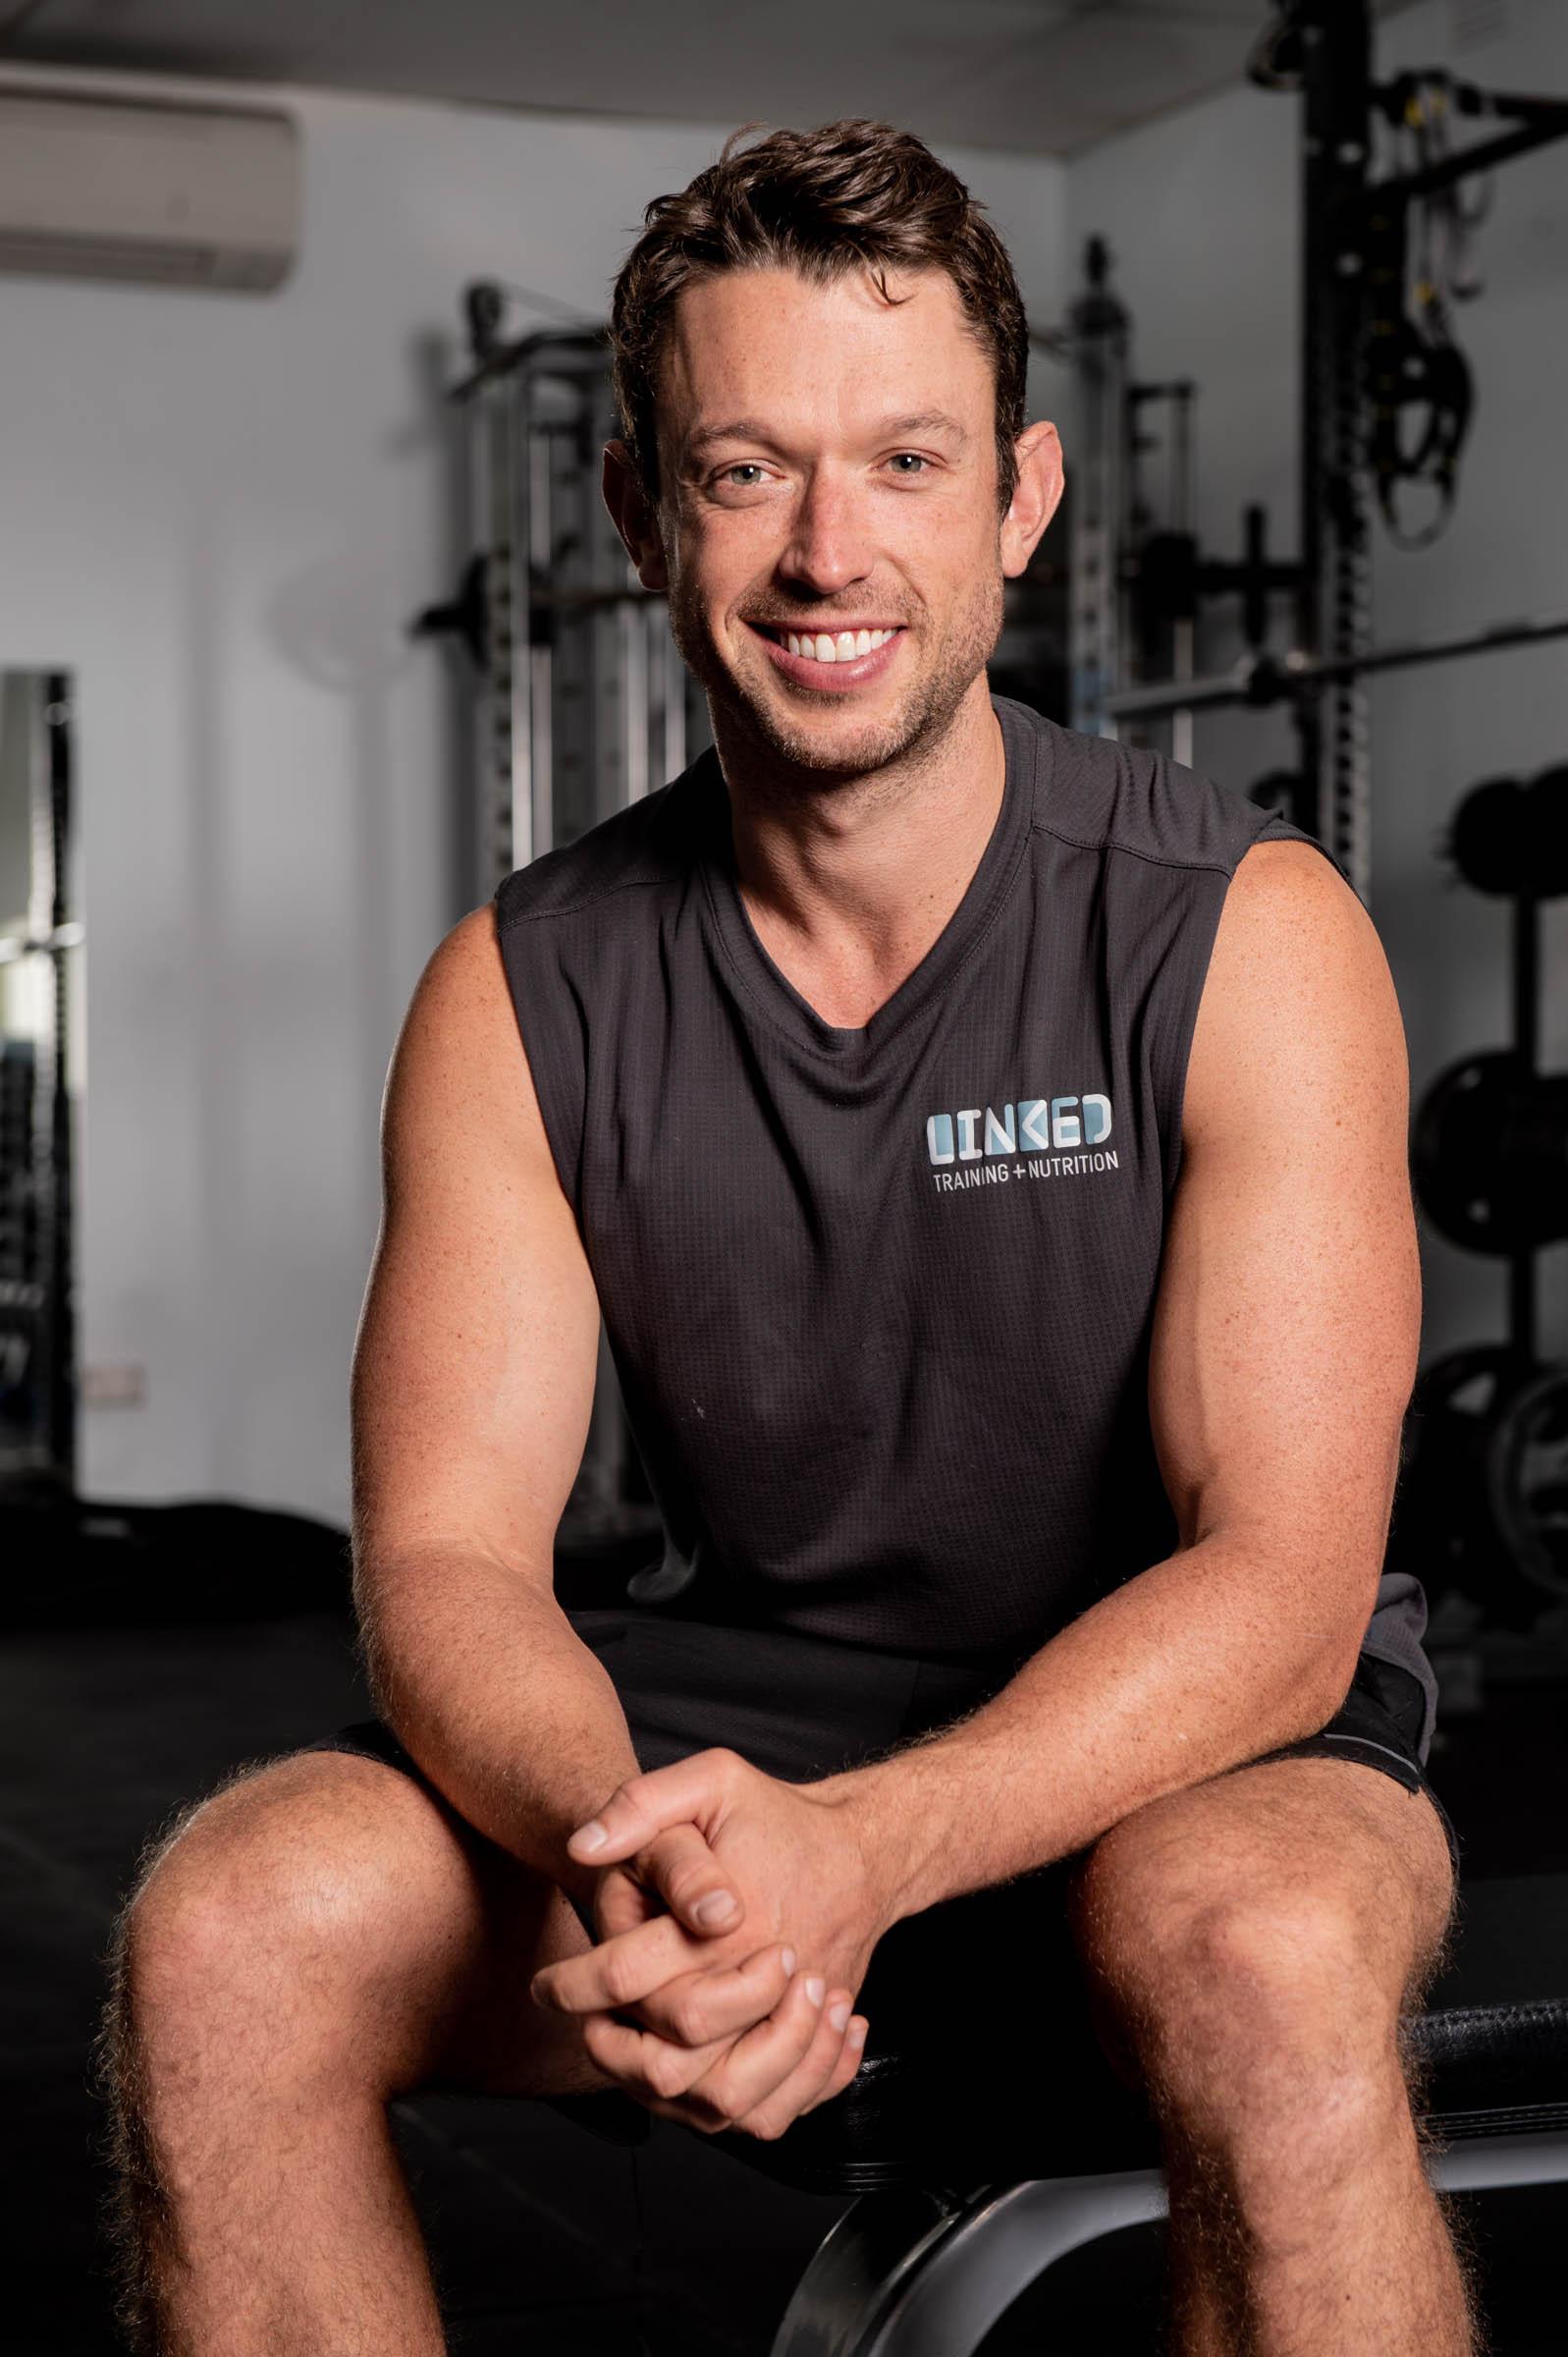 - Jack GeddesExercise Scientist & Personal Trainer